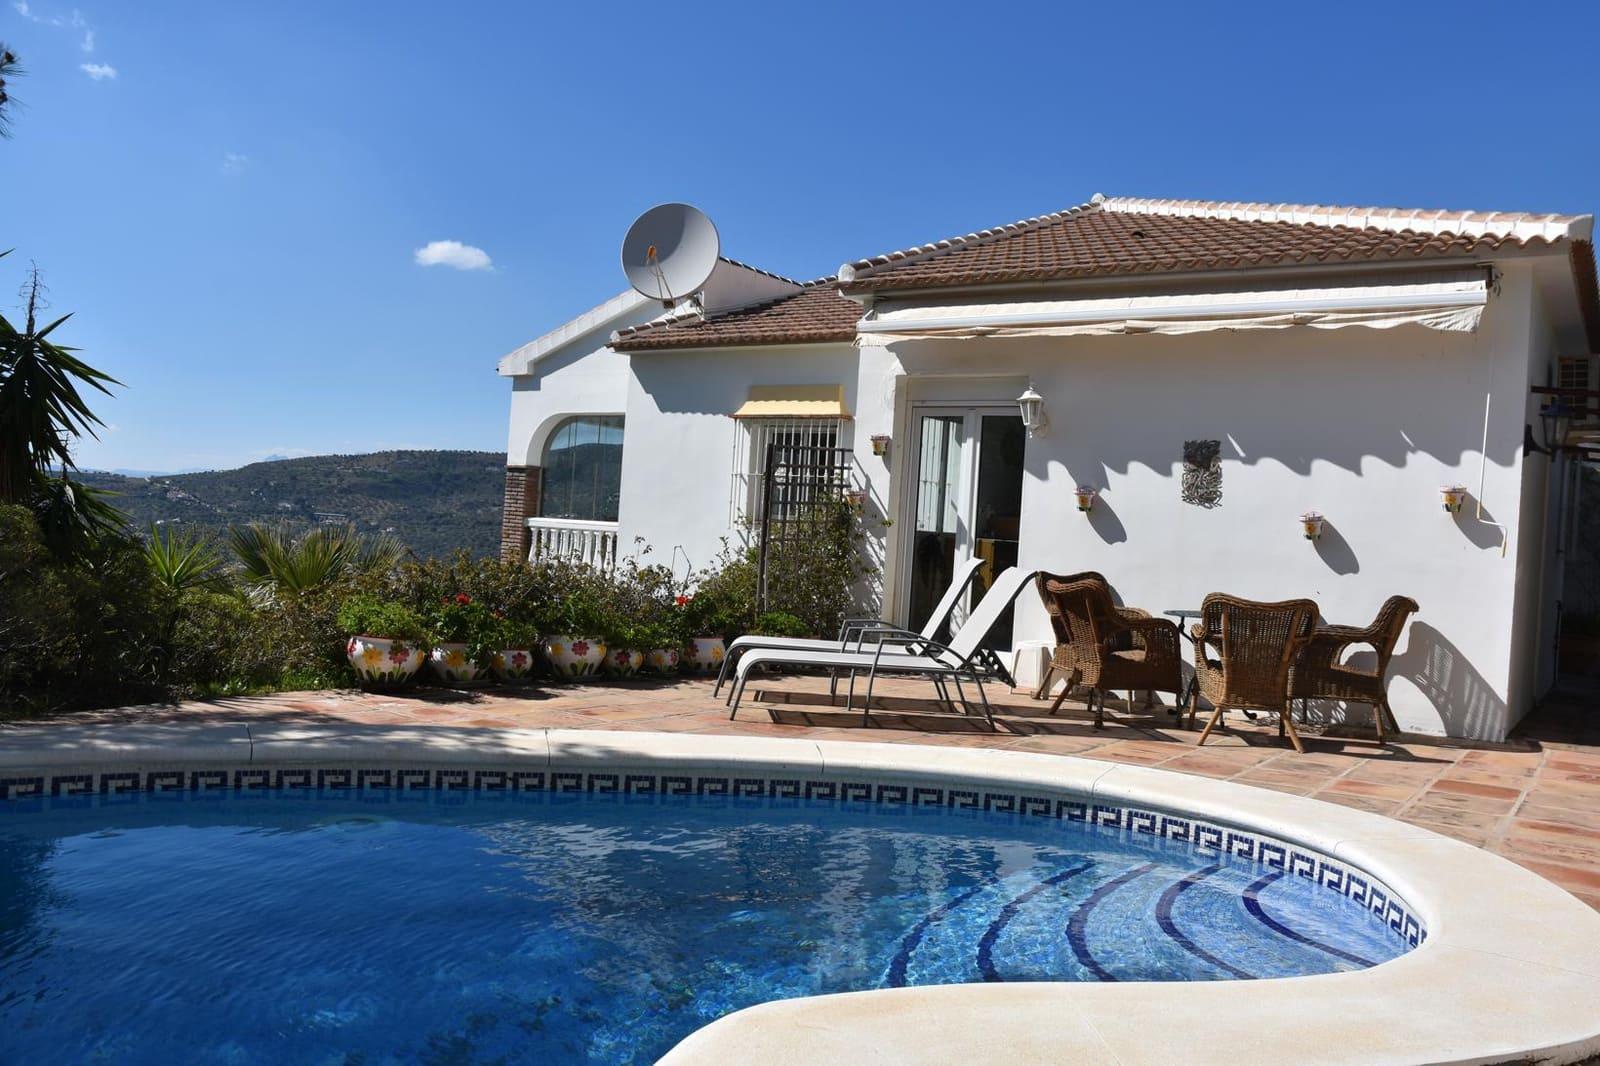 4 bedroom Villa for sale in Alcaucin with pool - € 274,000 (Ref: 4365518)